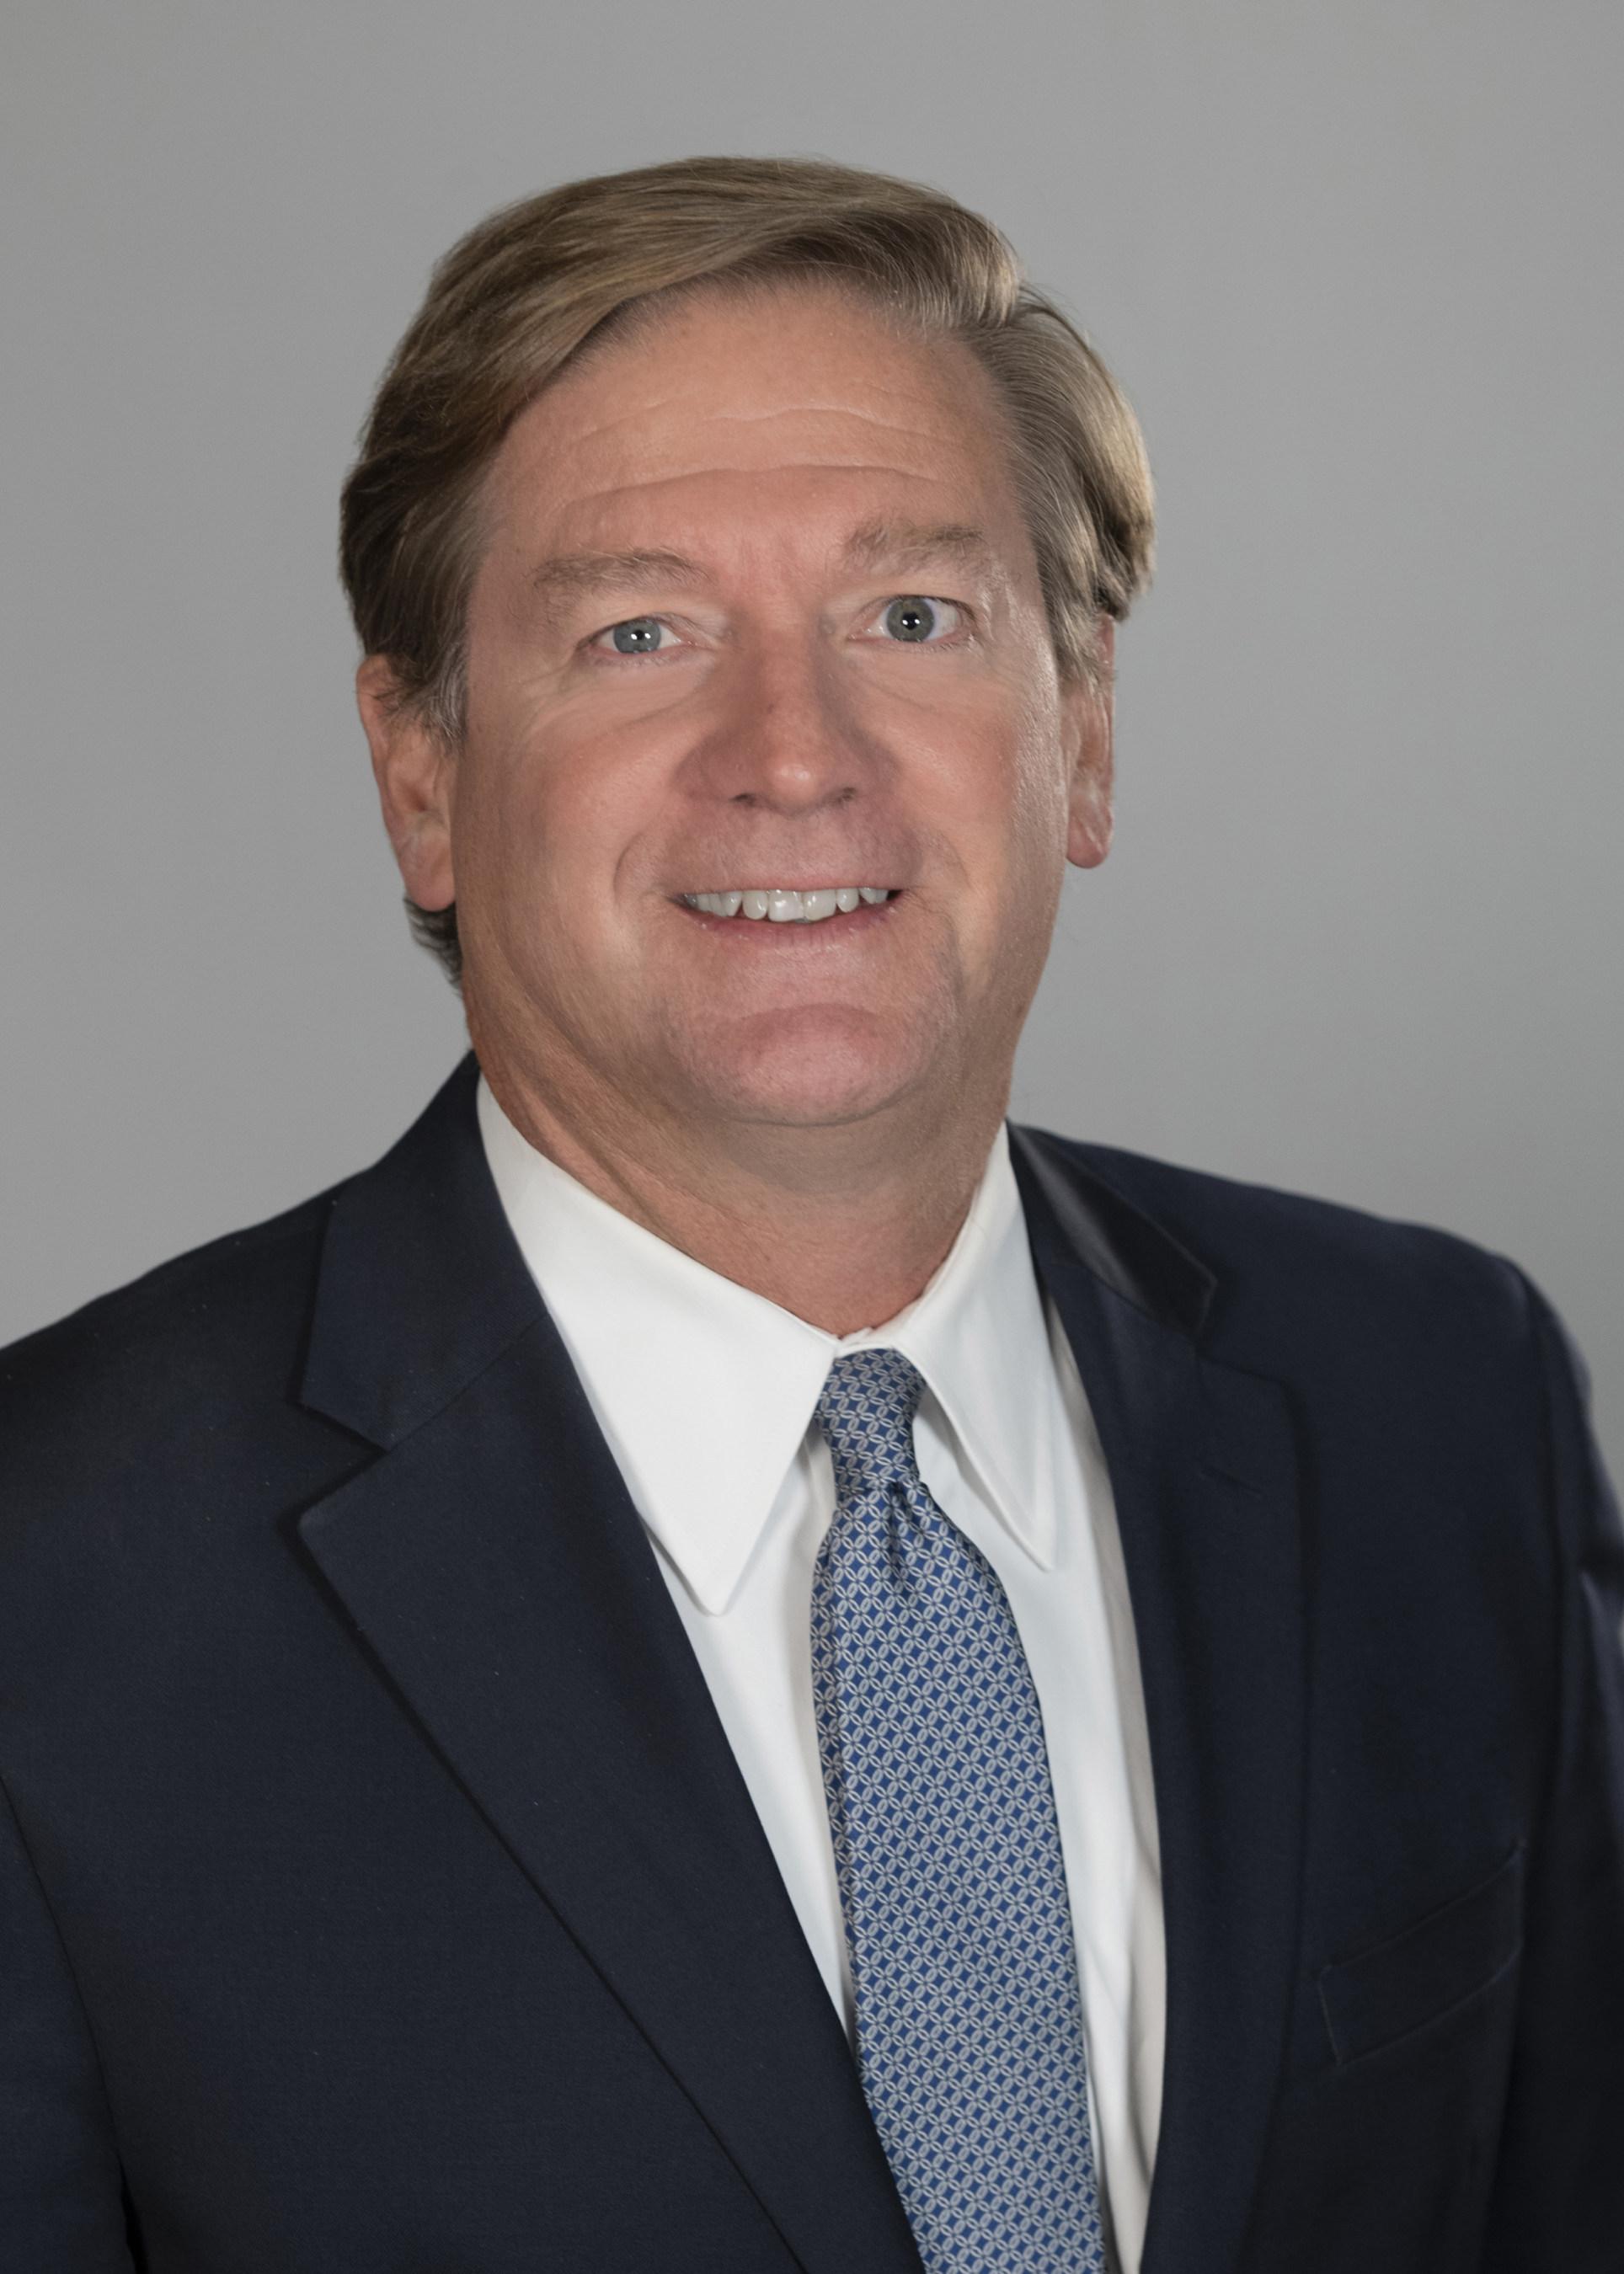 Walker College alumnus named chair of NAI Global 2019 ...